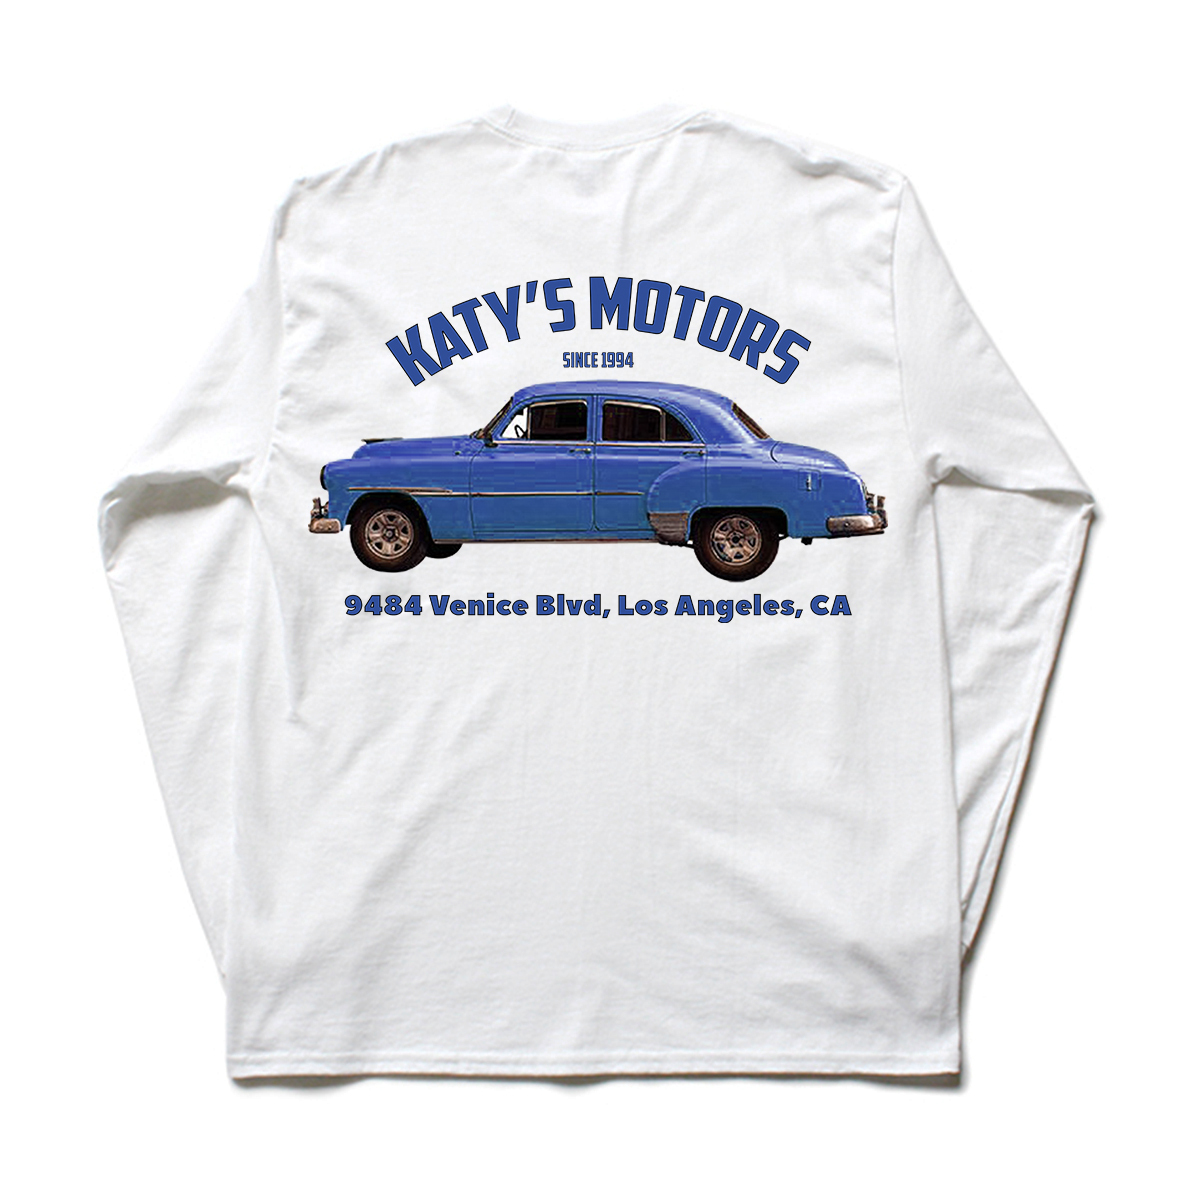 Katy's Motors Souvenir Long Sleeves